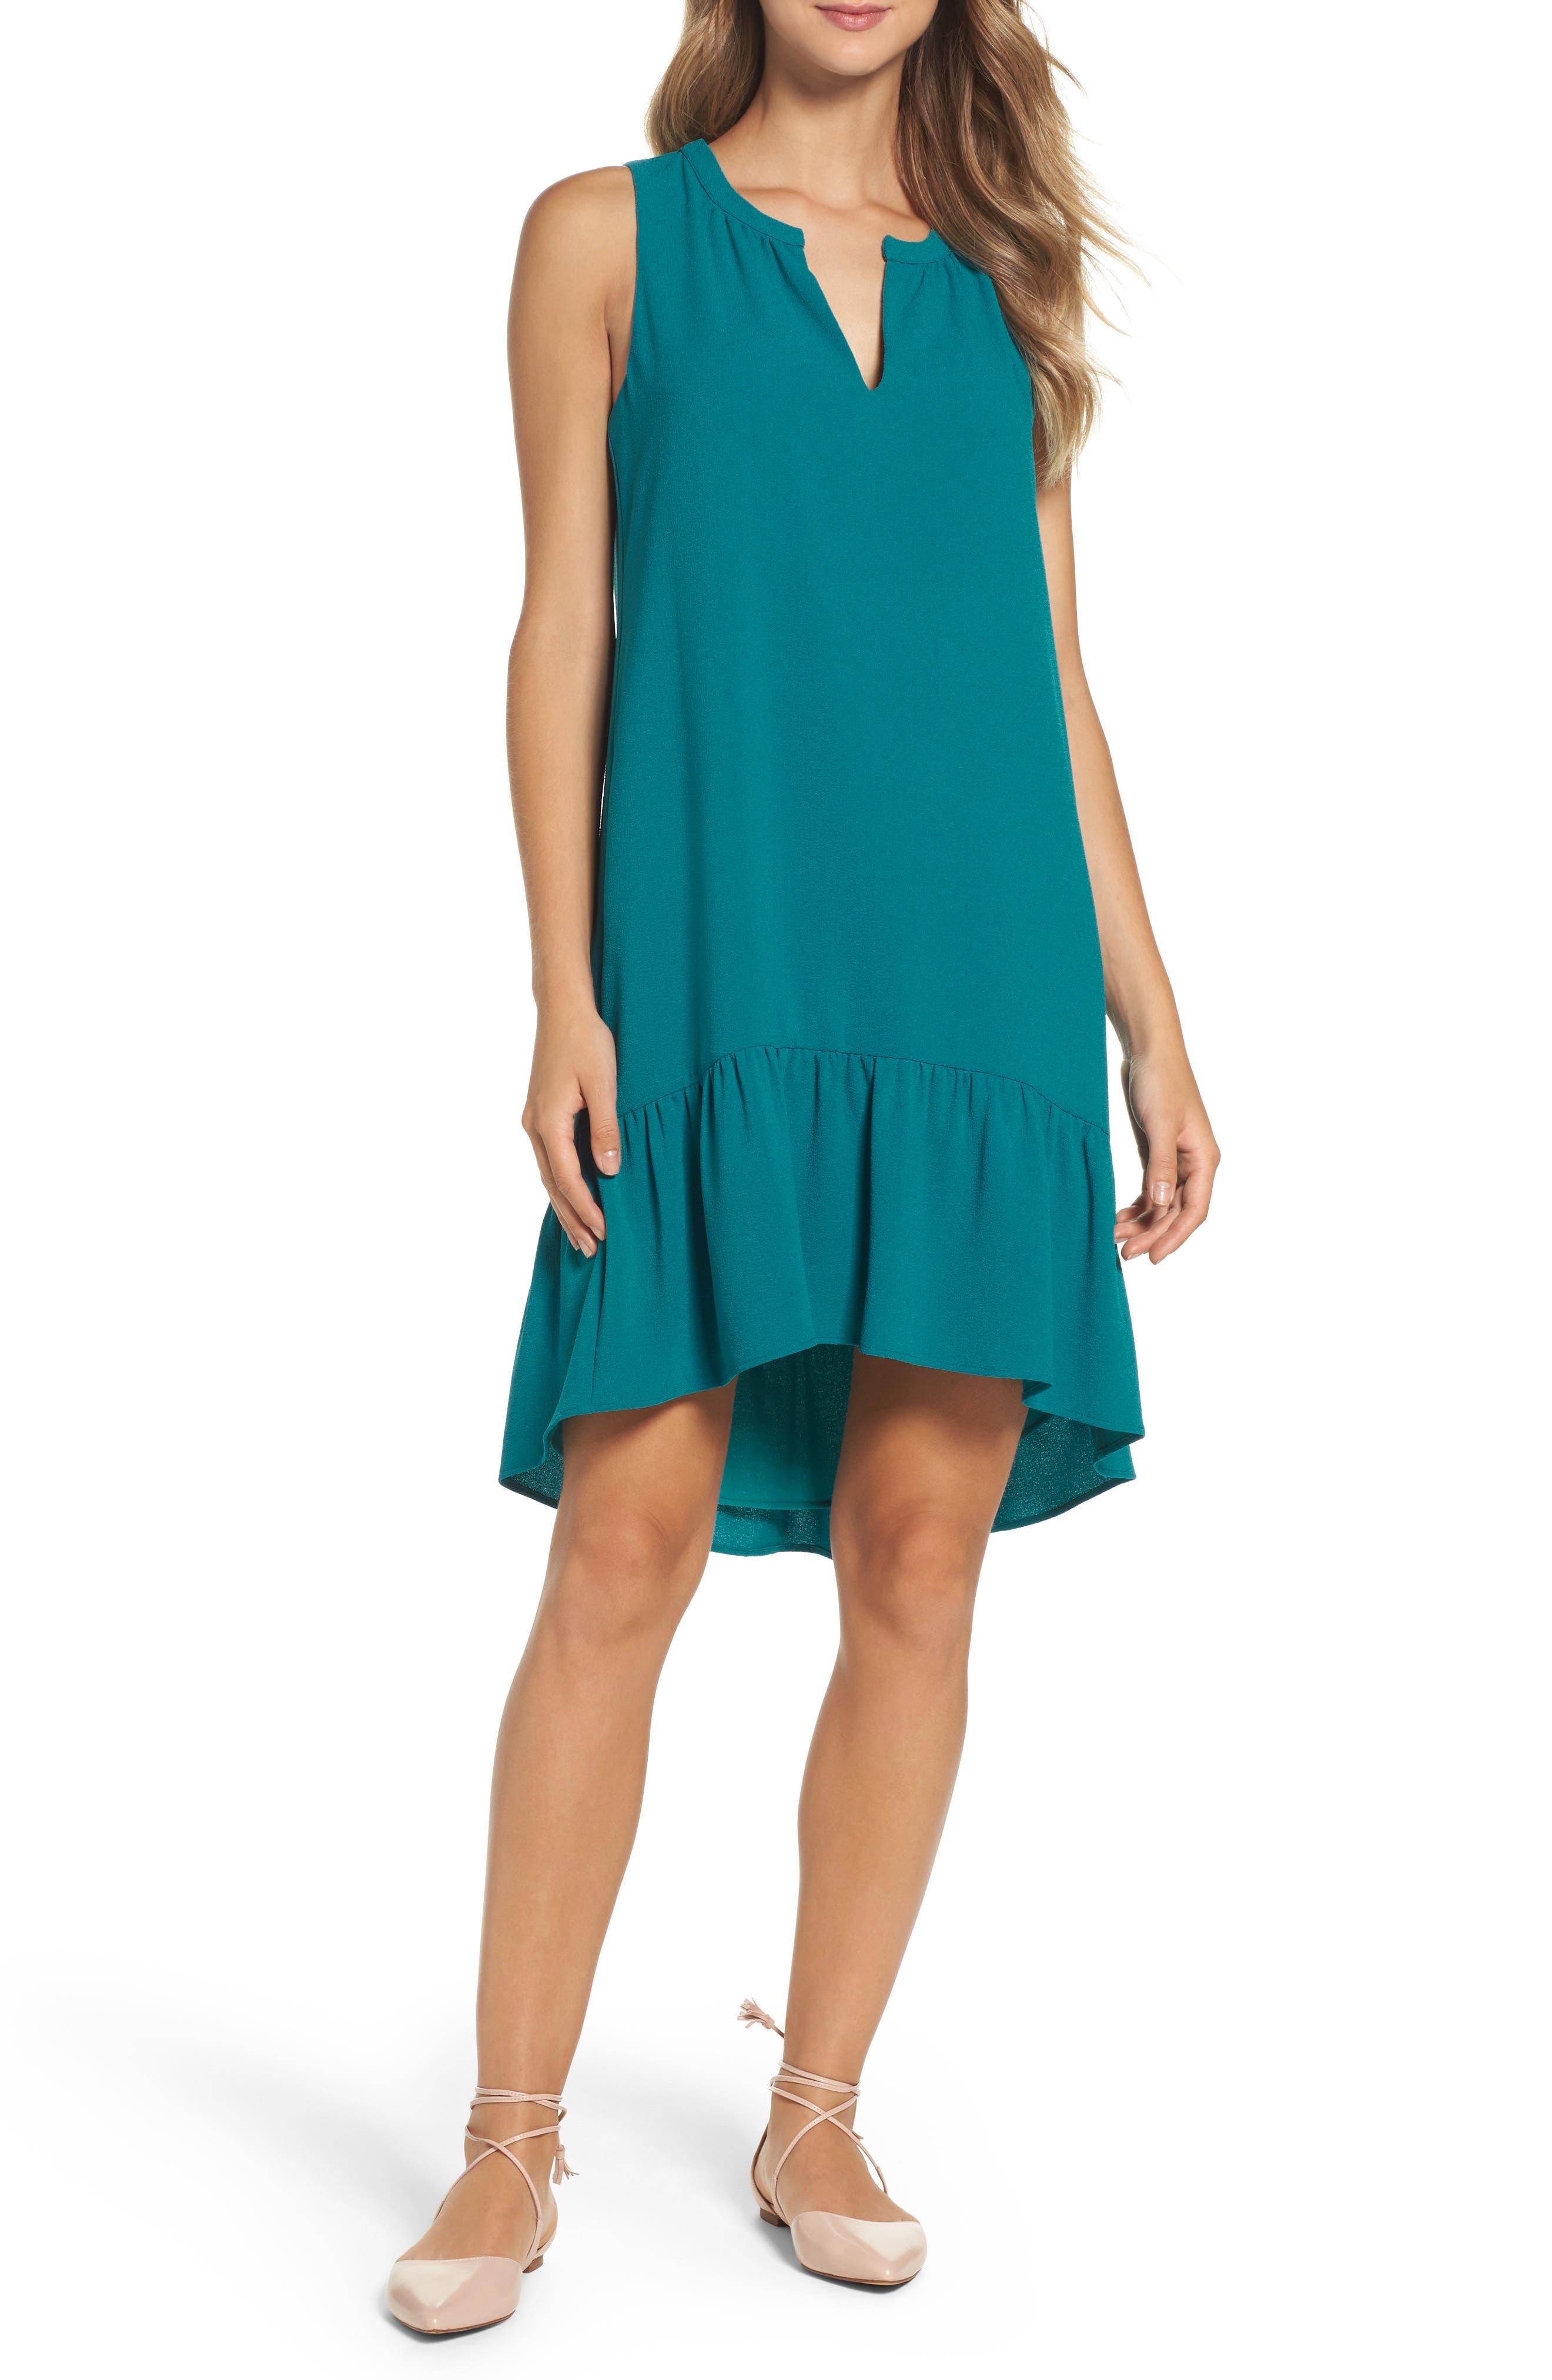 Alternate Image 1 Selected - Charles Henry High/Low Ruffle Shift Dress (Regular & Petite)